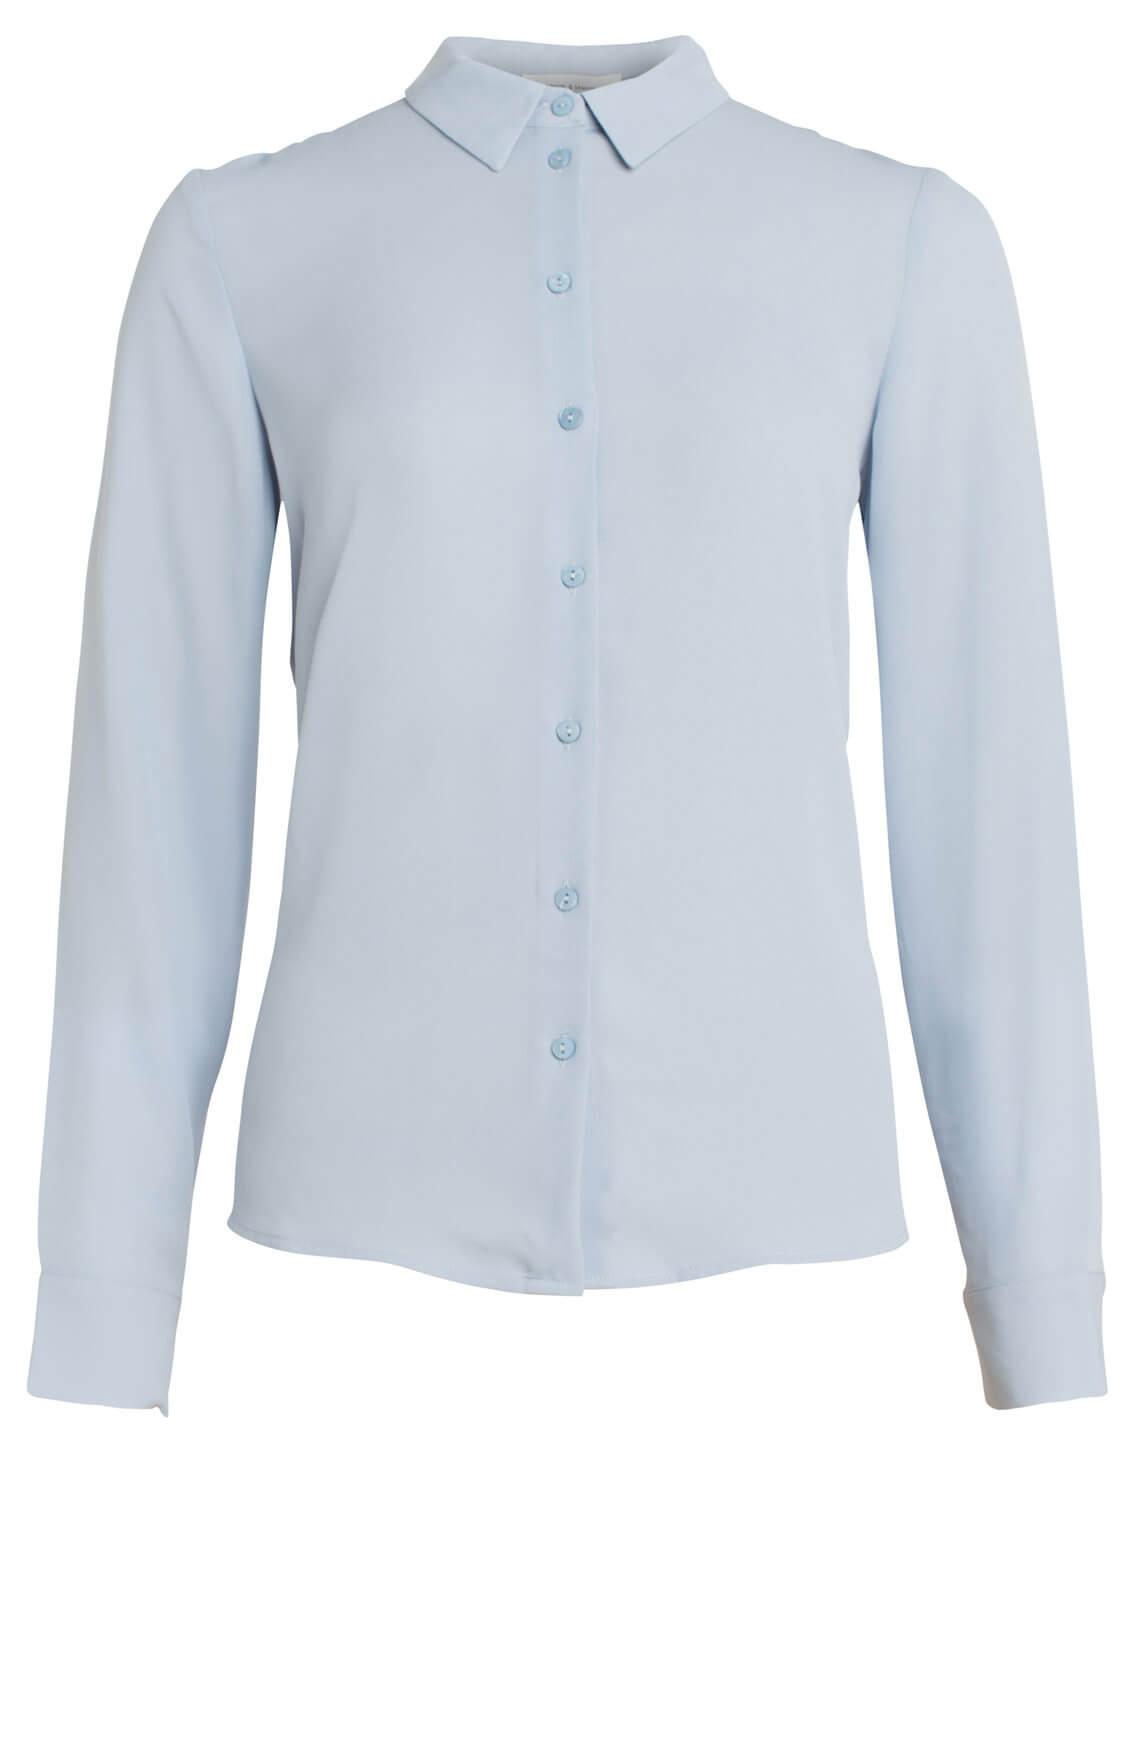 Samsoe Samsoe Dames Milly blouse Blauw